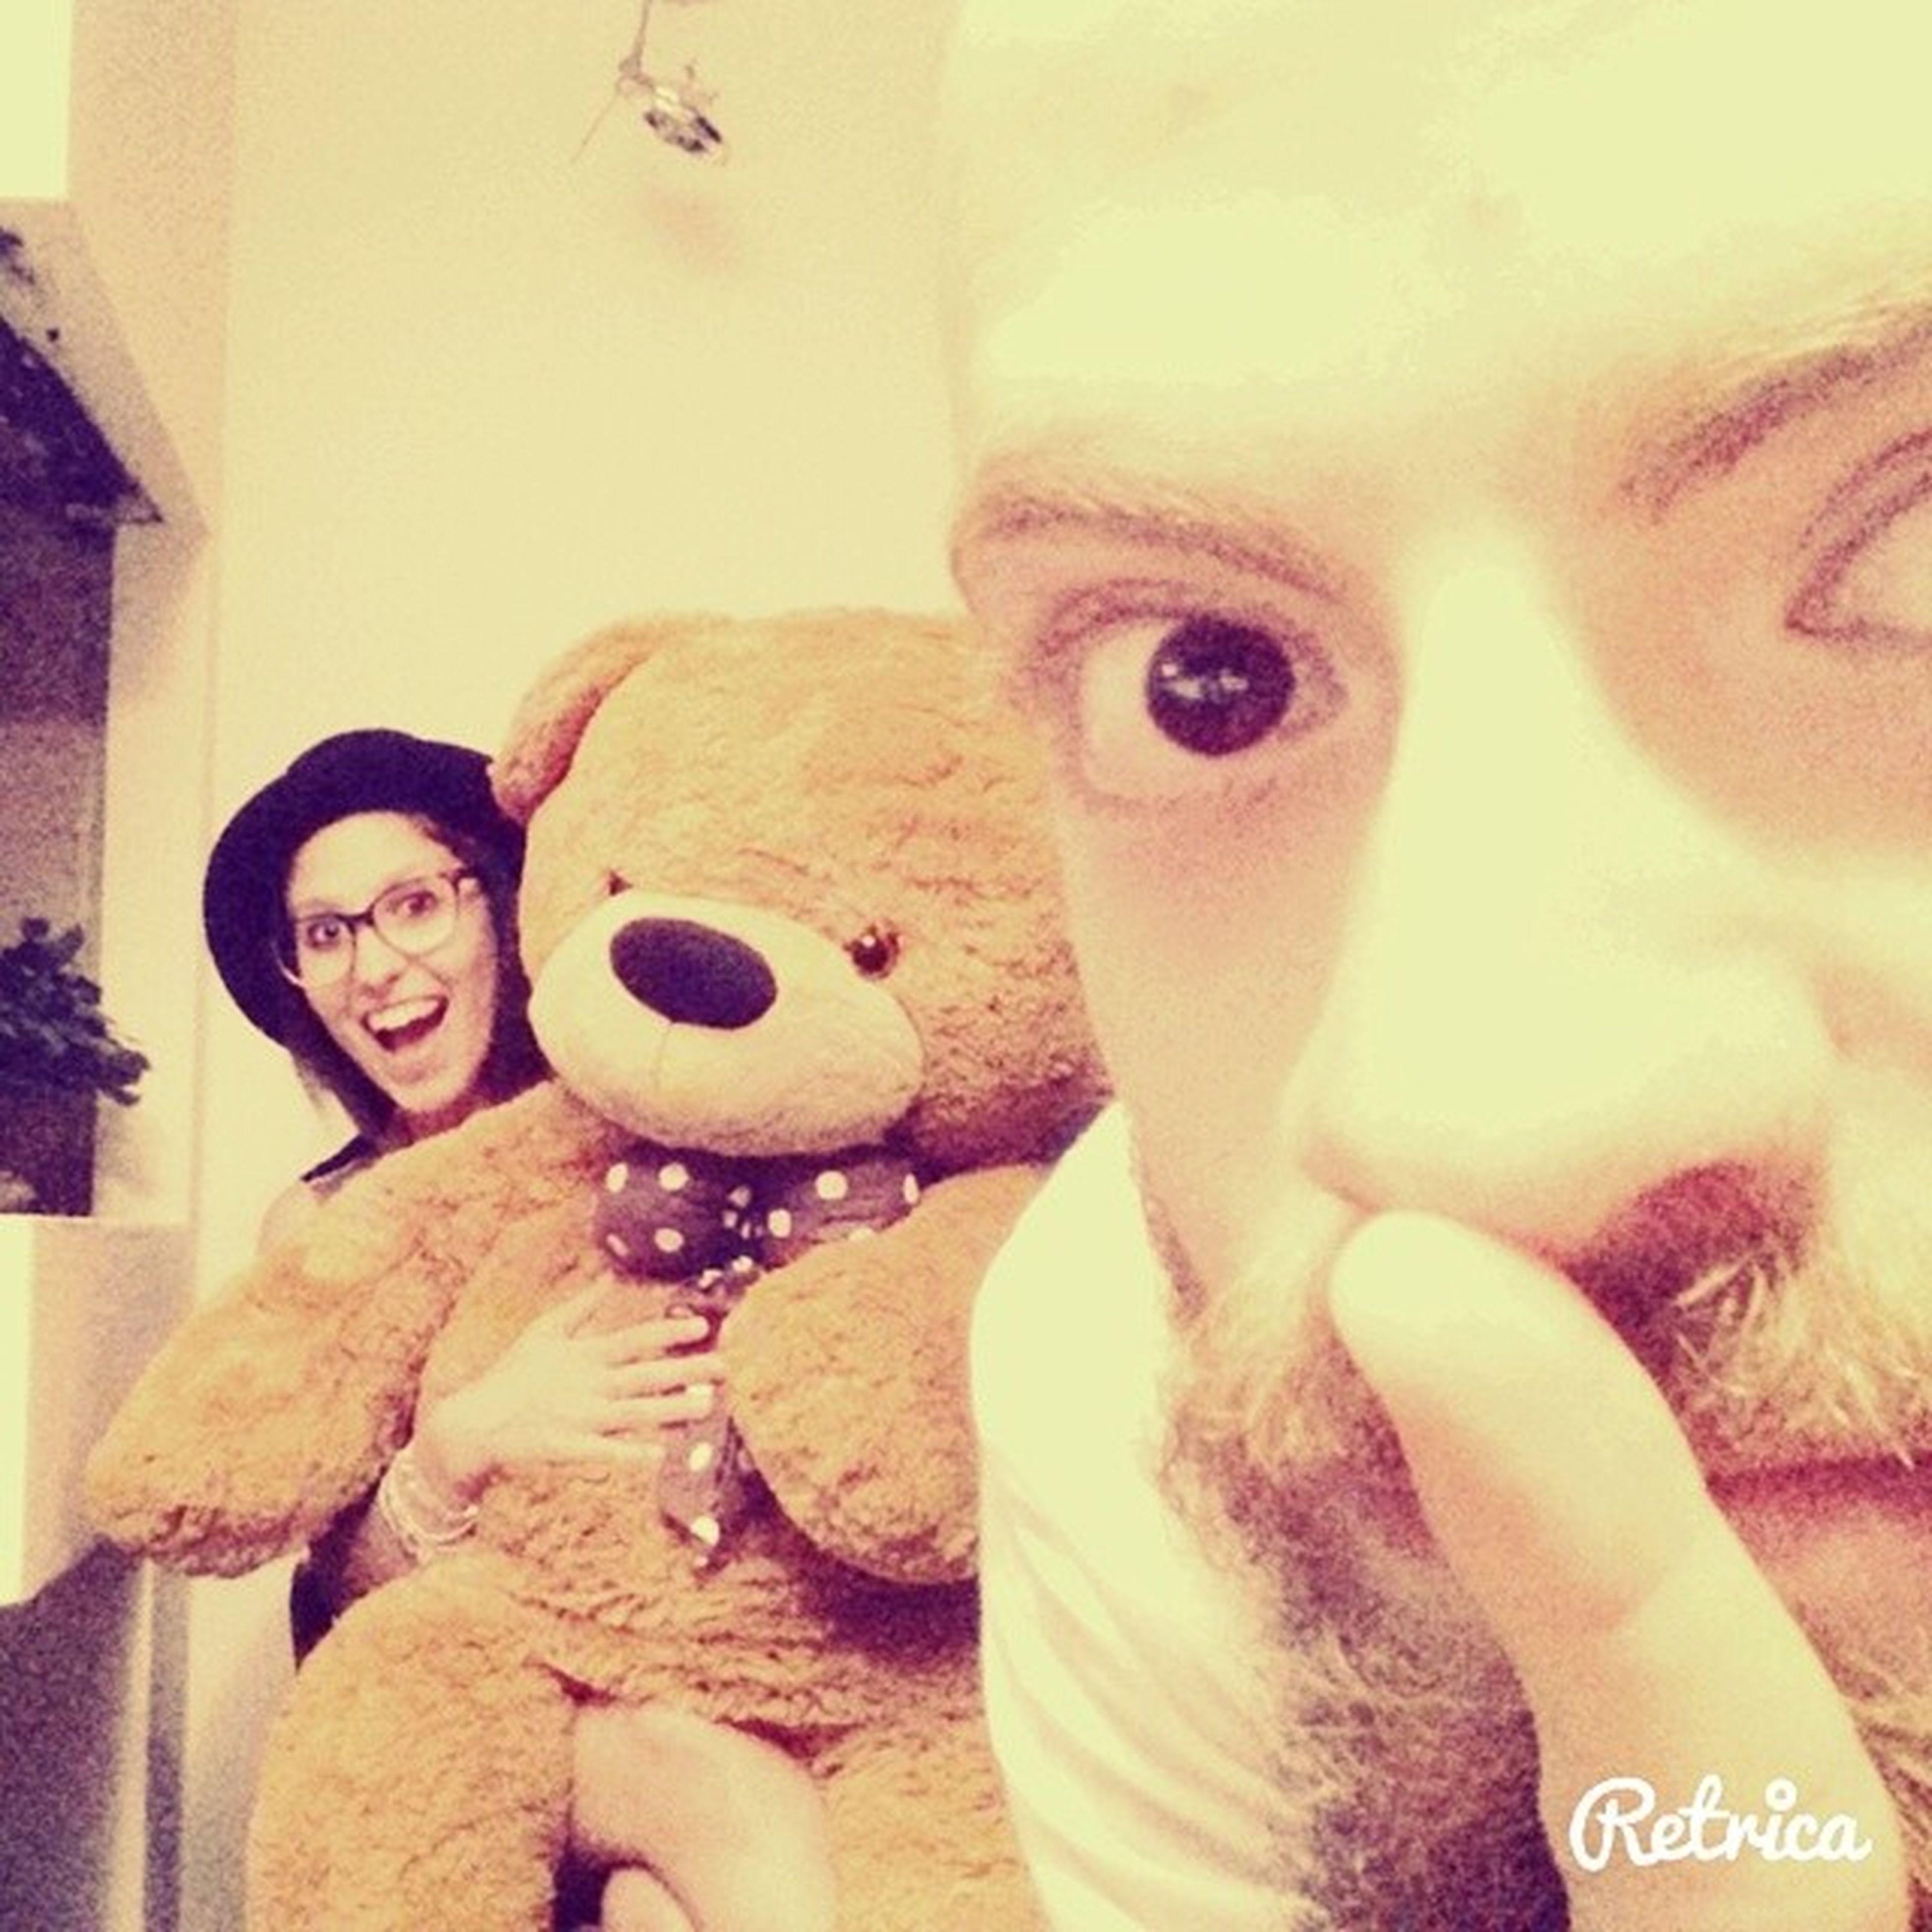 • Tanti auguri giadì! • Teddybear Gigante Immensolui